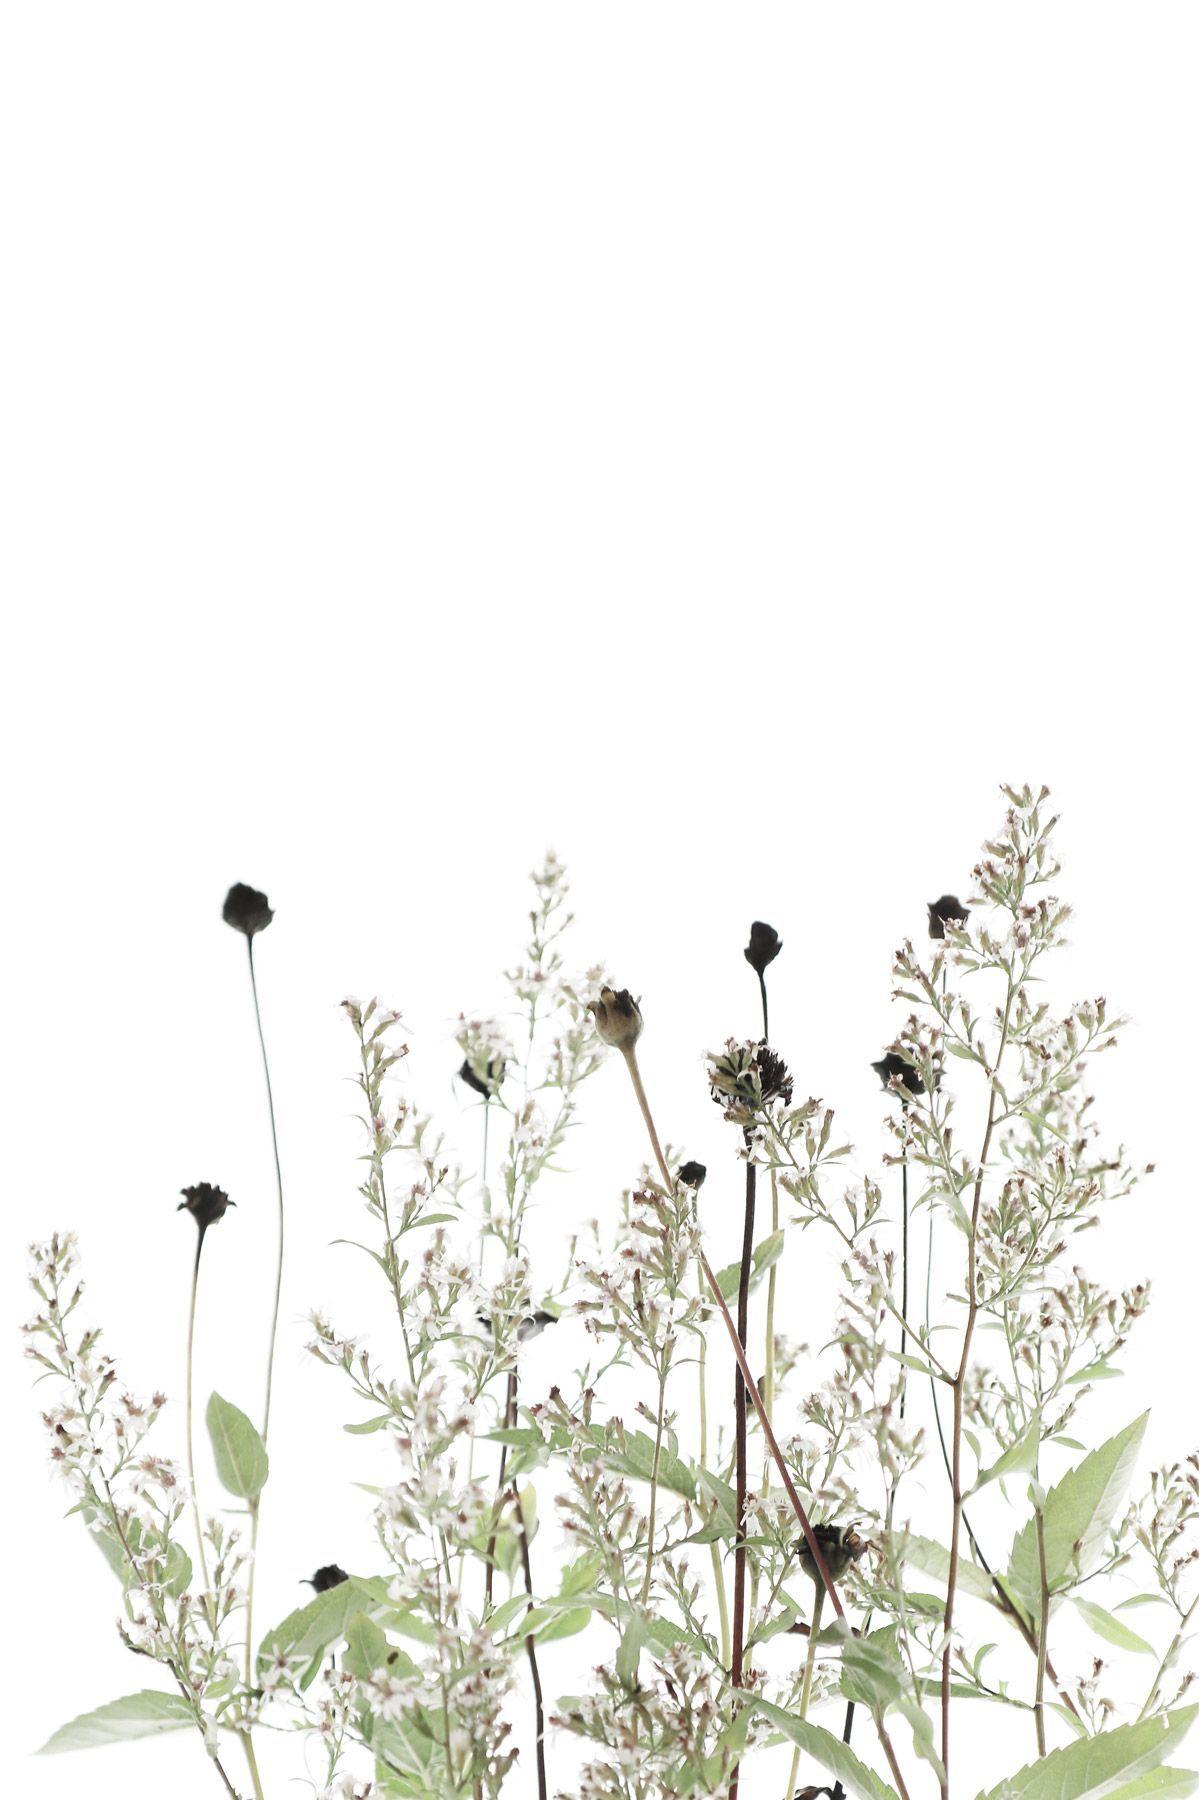 Aesthetic Drawings Flowers Wallpapers Wallpaper Cave